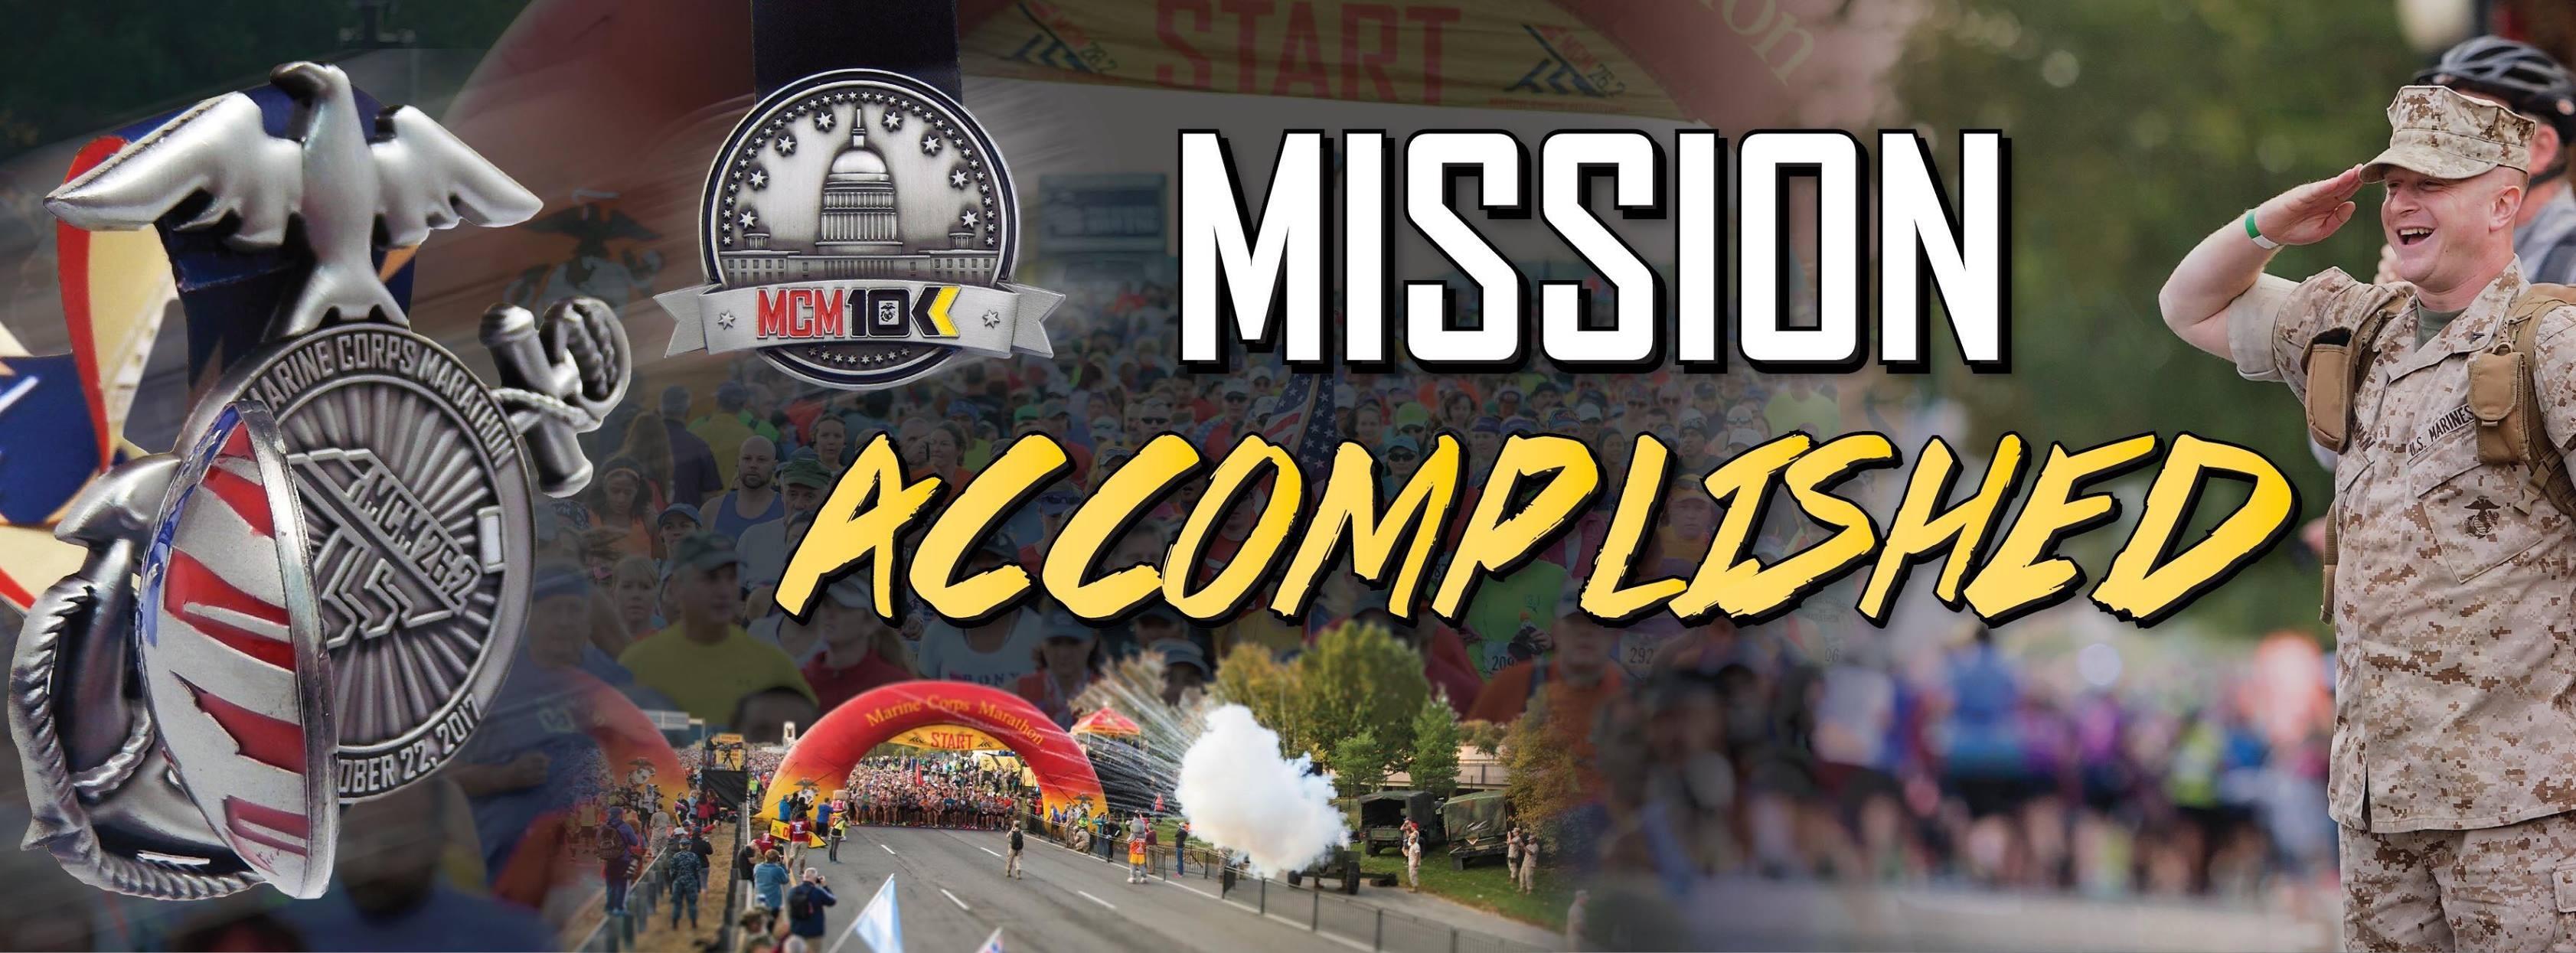 Marine Corps Marathon - cover image